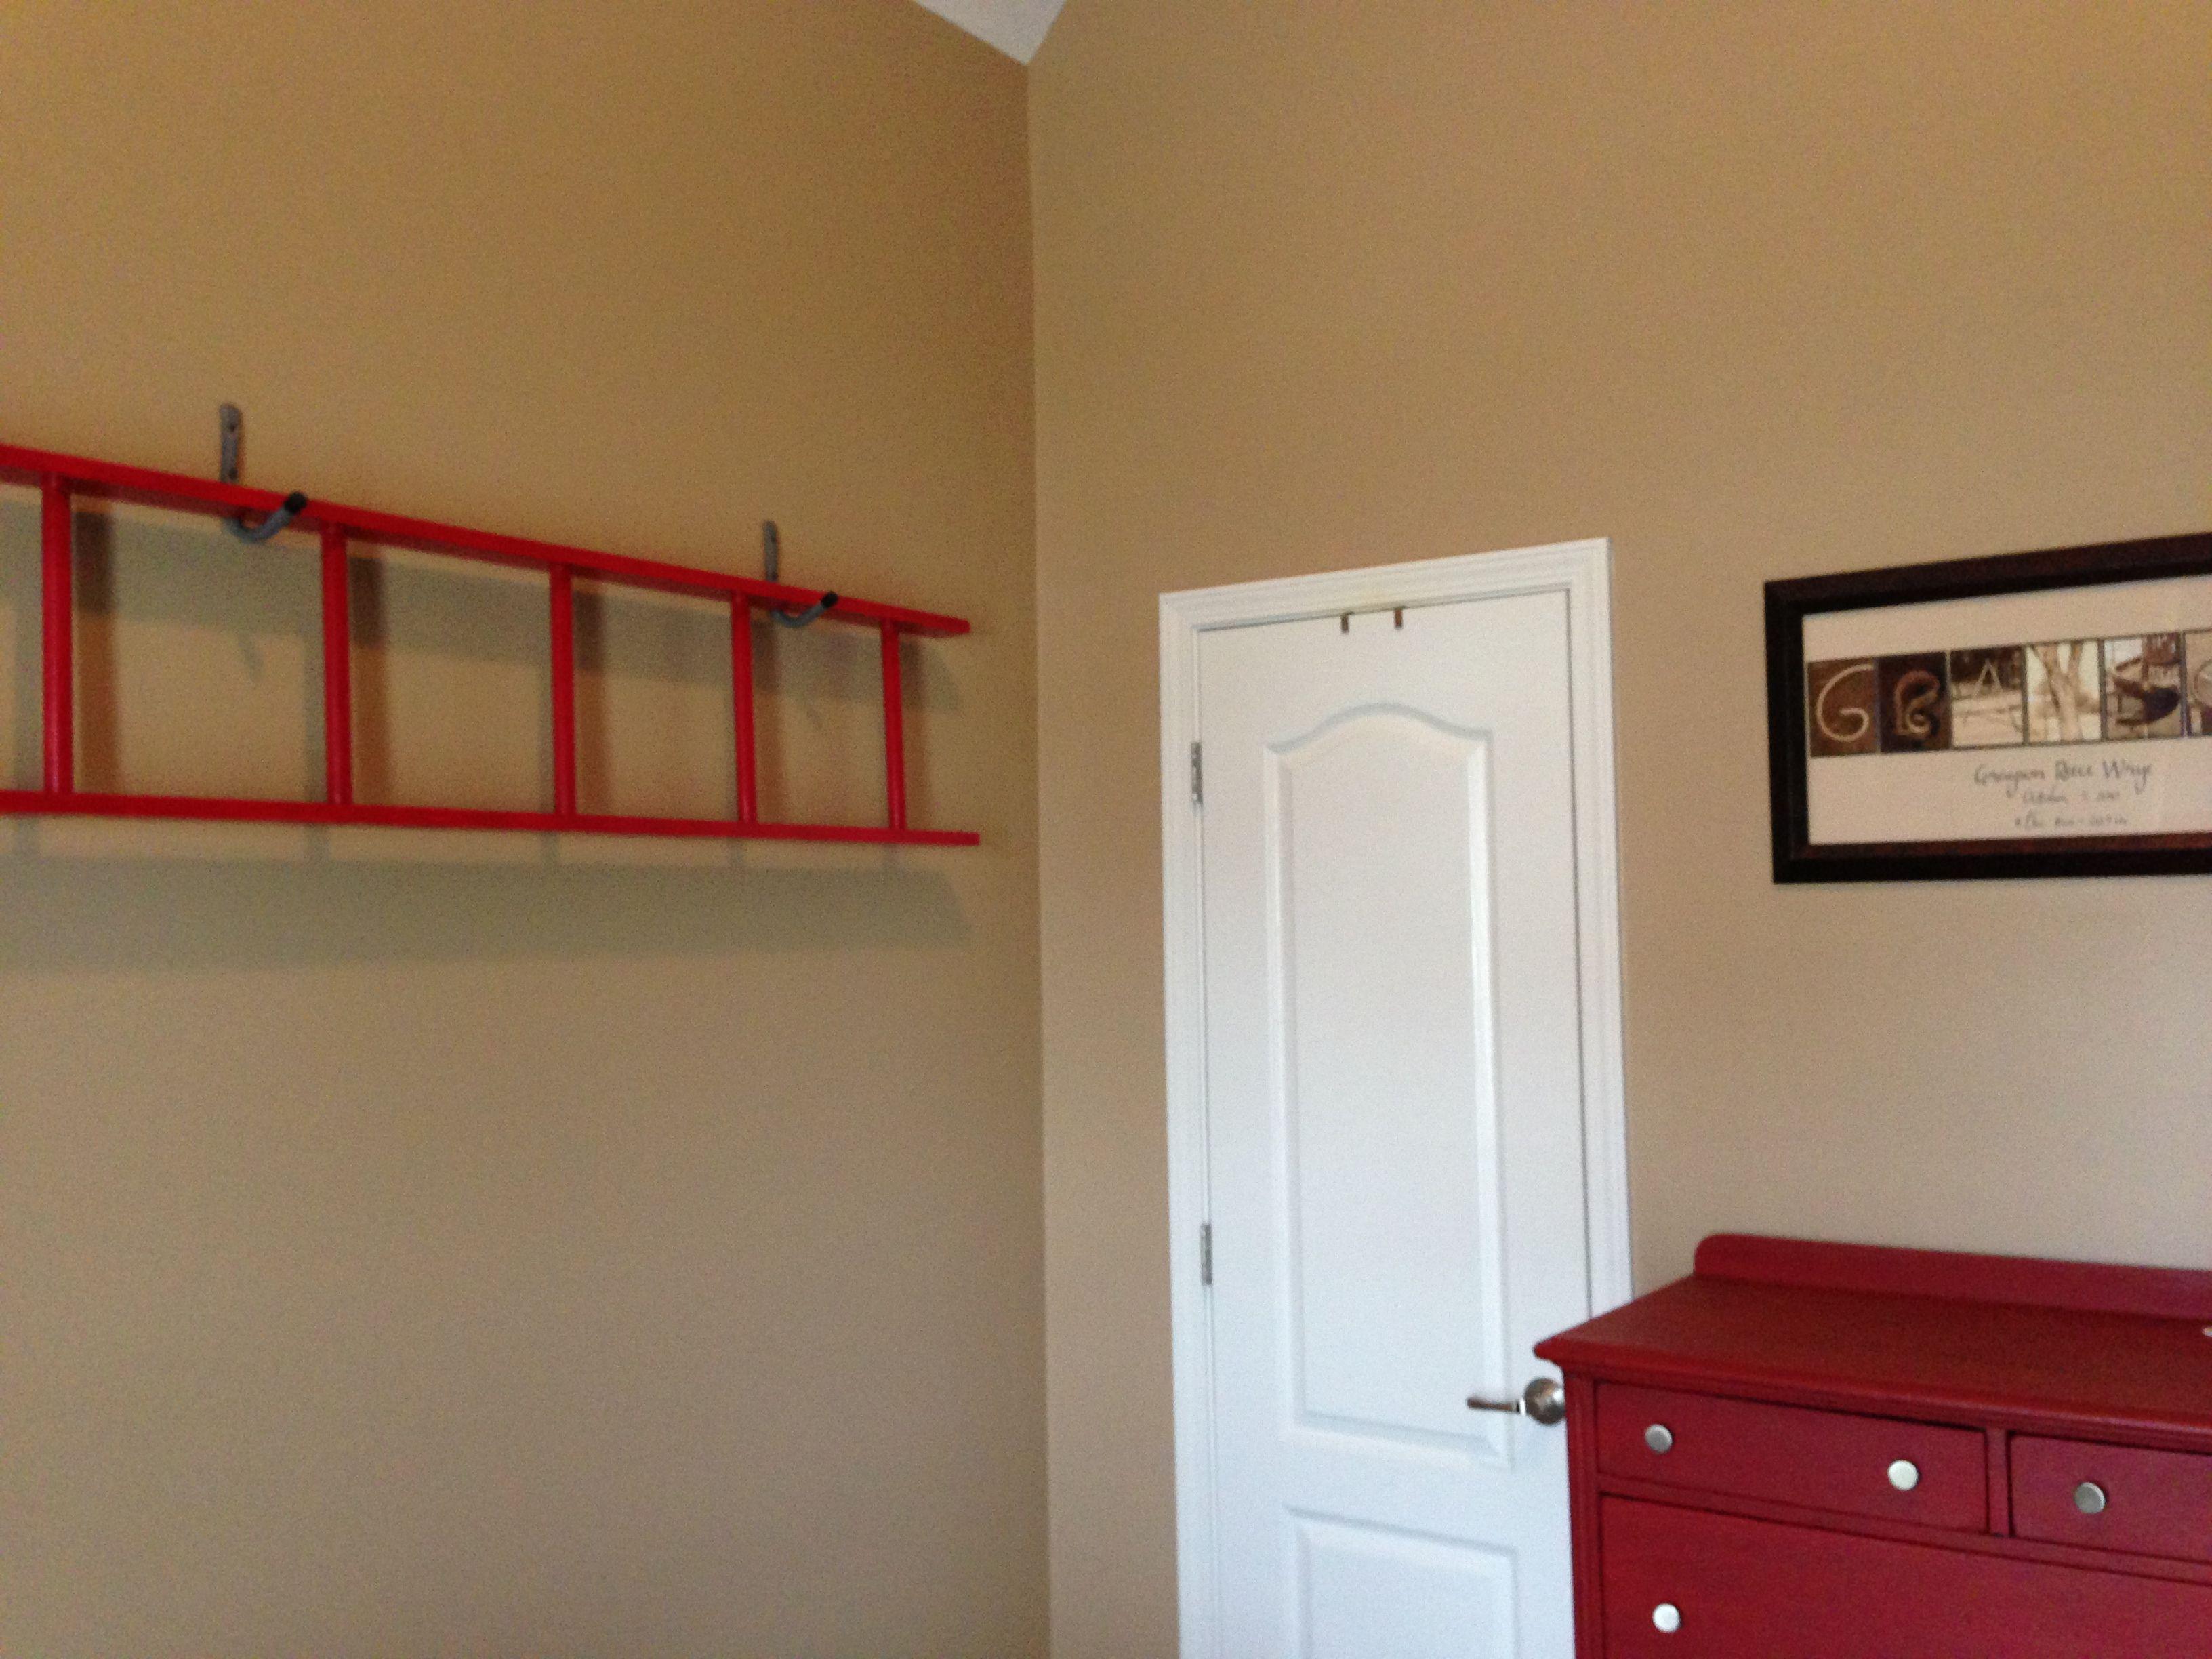 Ladder decor for toddler firetruck room austinus bedroom ideas in